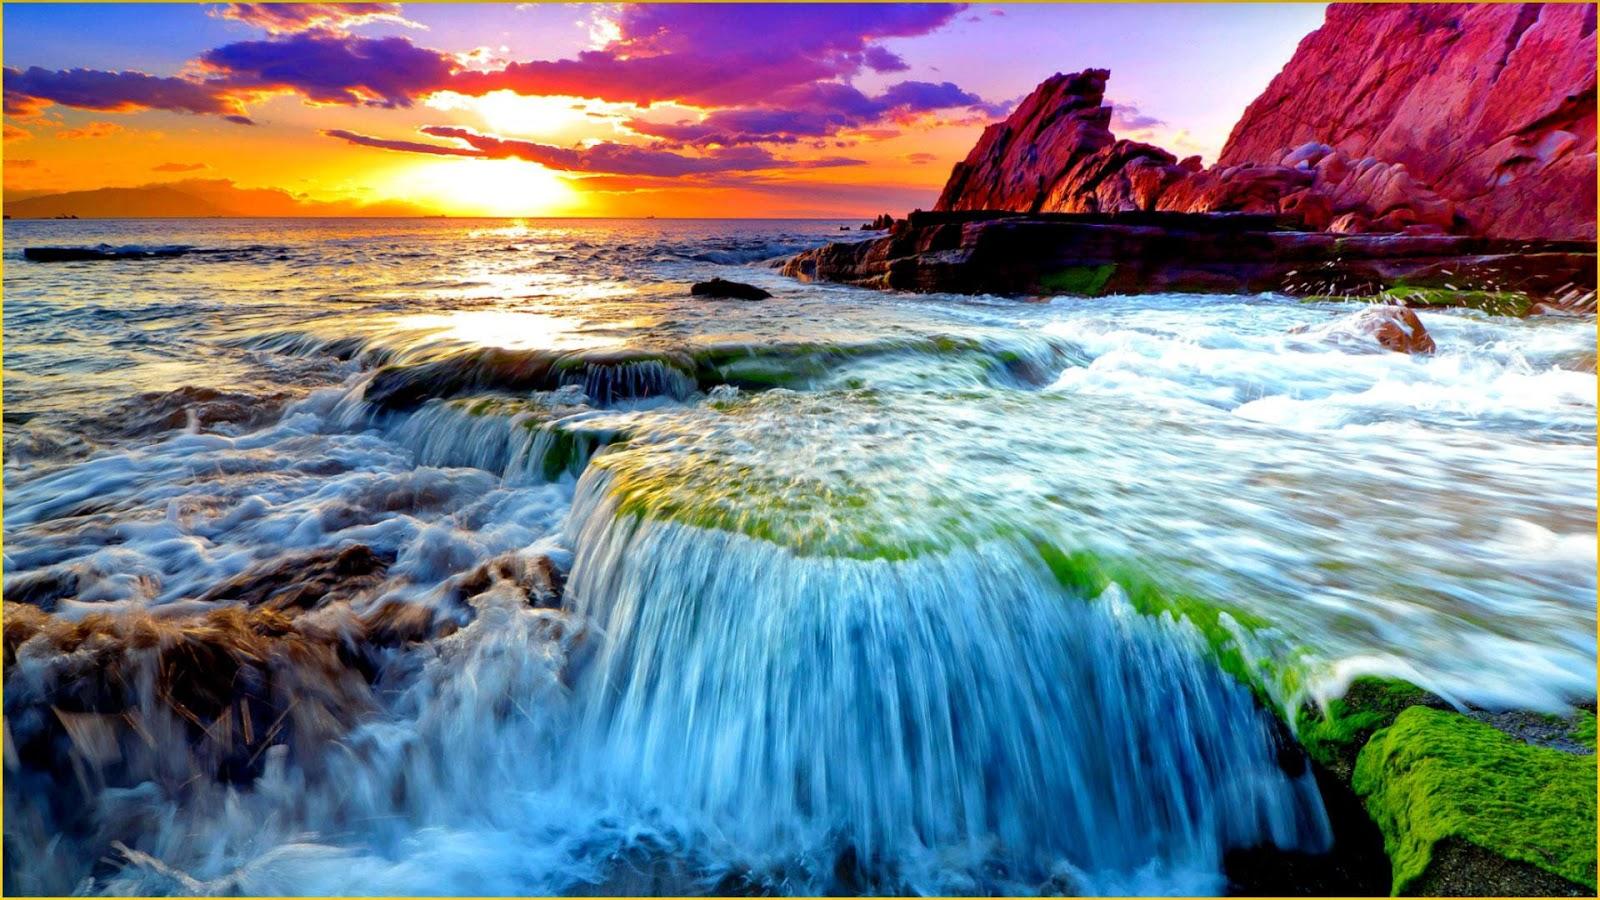 Ocean Wallpaper Hd